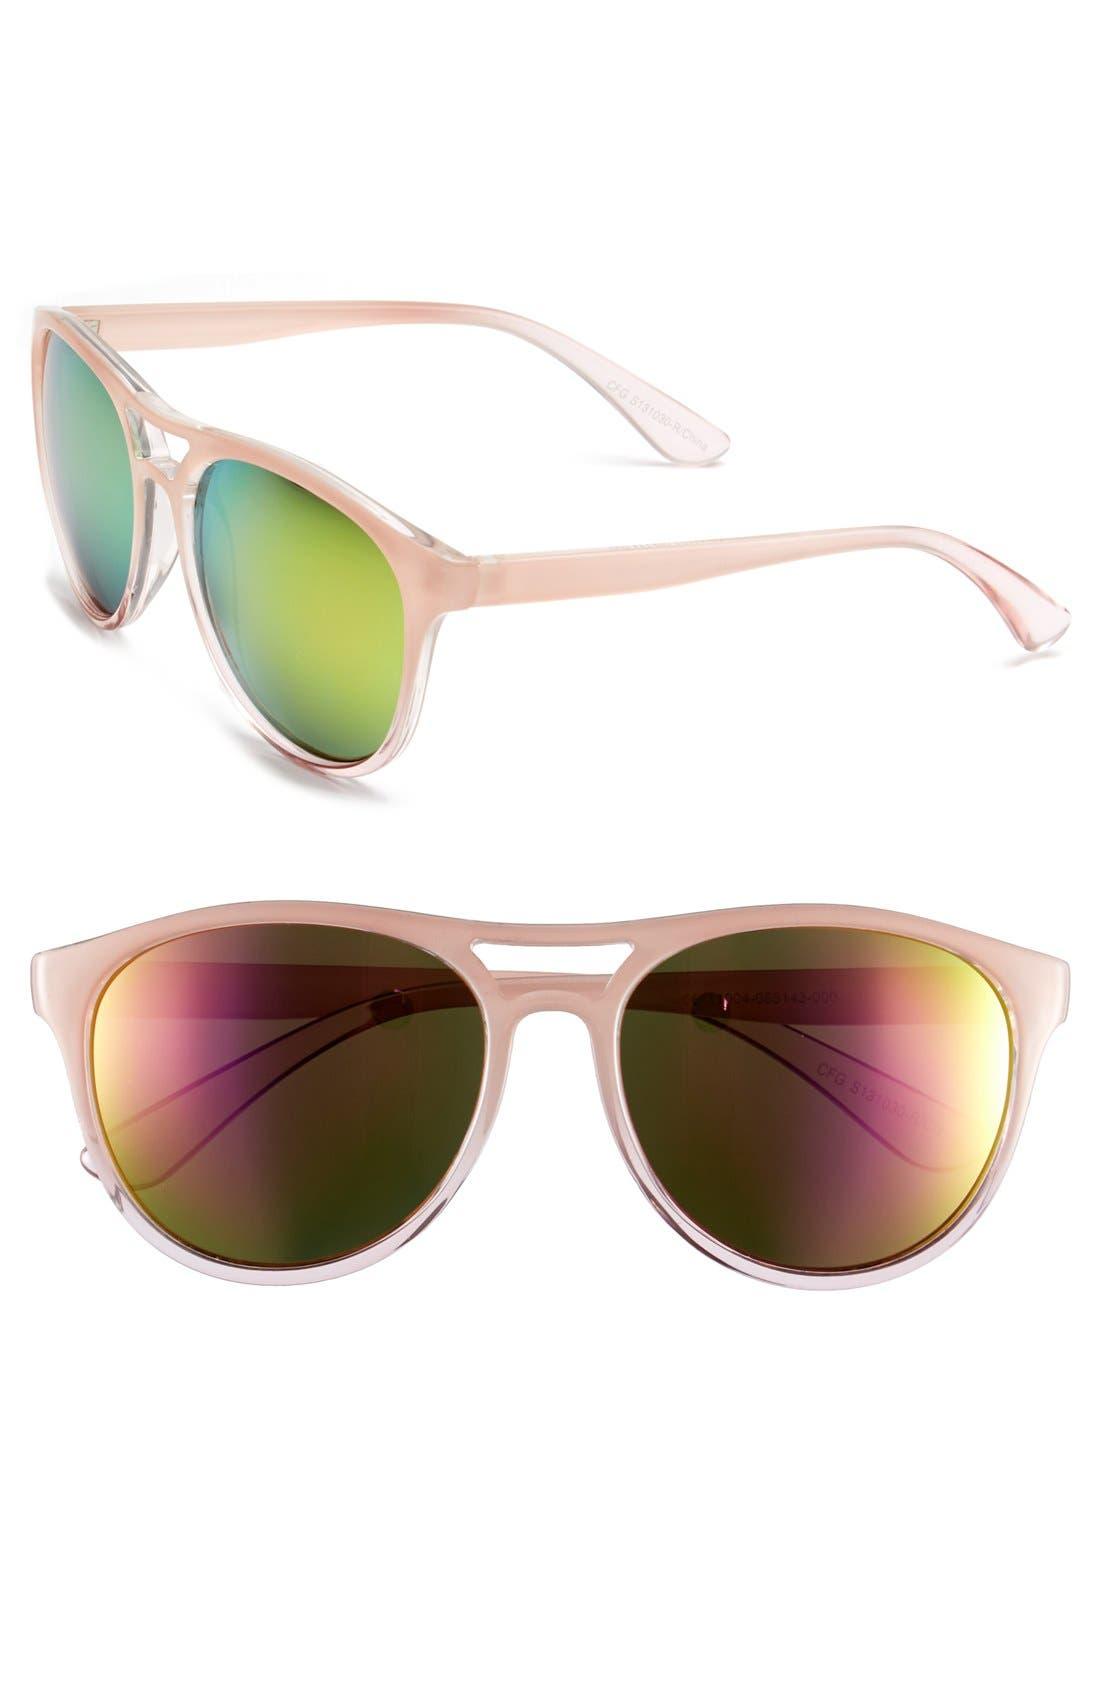 55mm Oversize Retro Sunglasses,                         Main,                         color, Pink